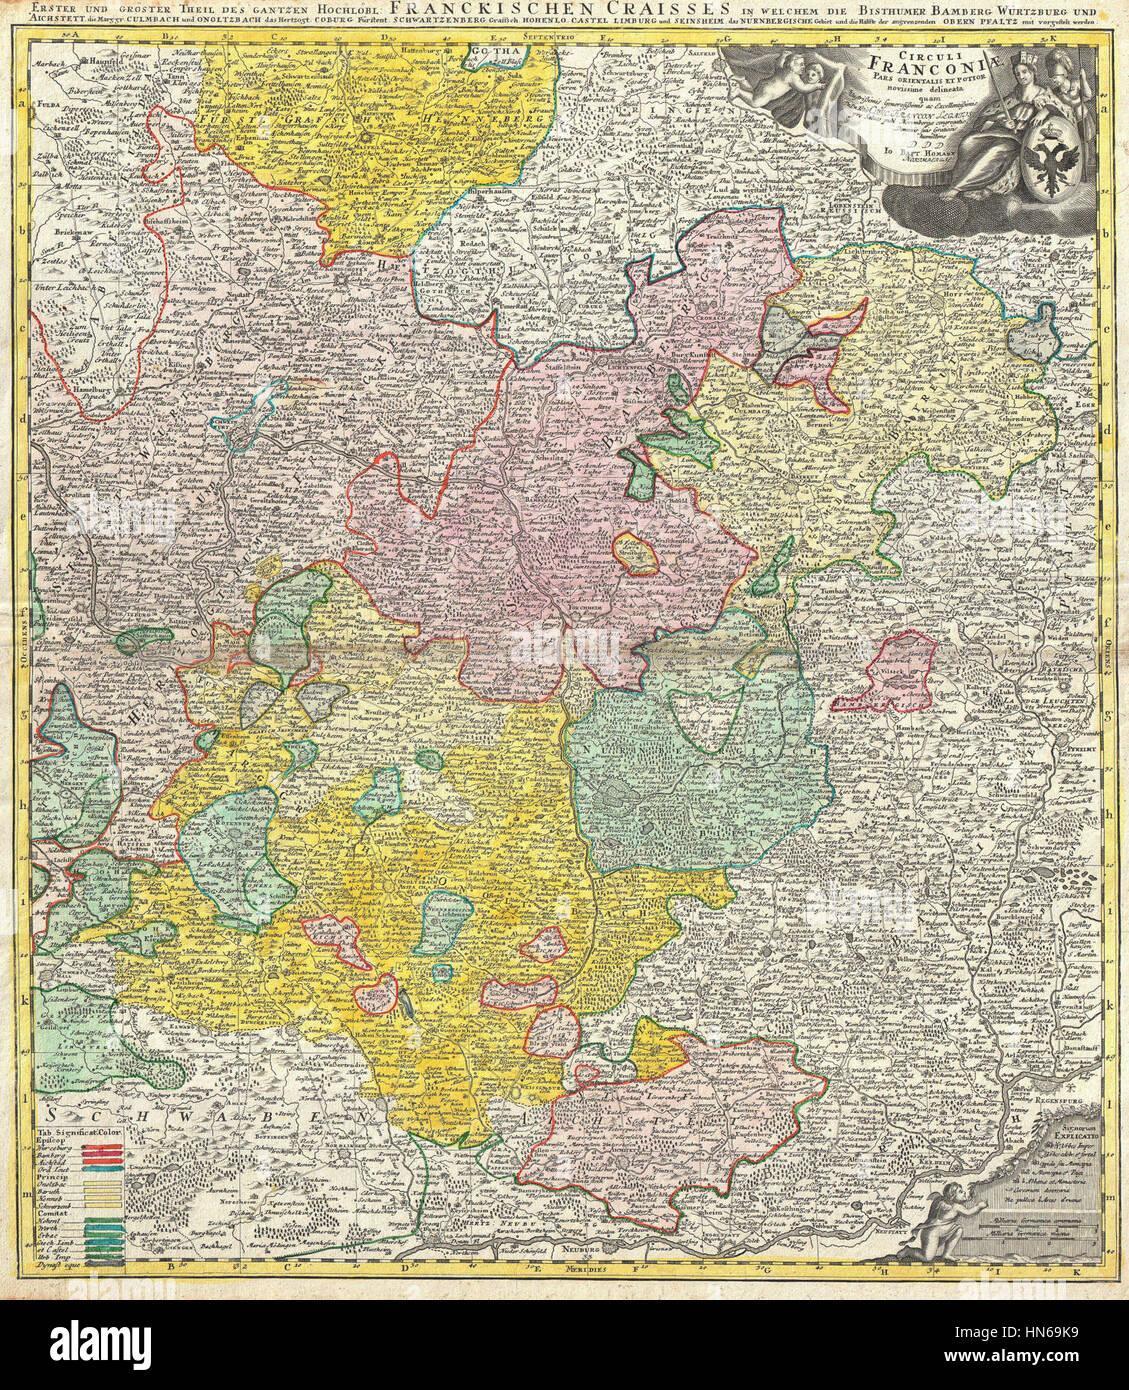 Karte Bamberg.Bamberg Deutschland Bayern Nurnberg Geographicus